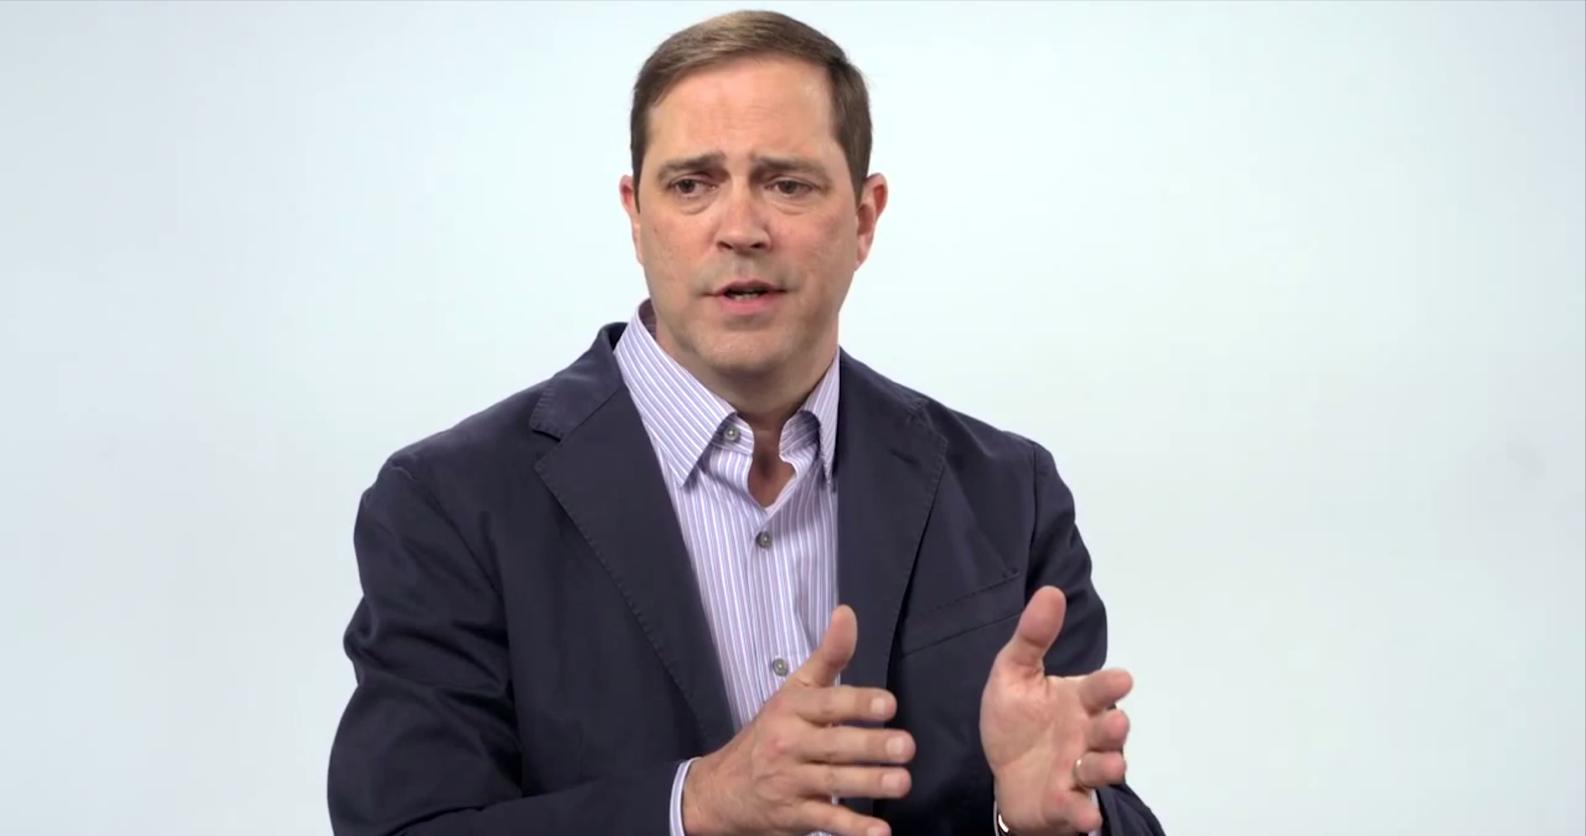 Cisco CEO Chuck Robbins screenshot